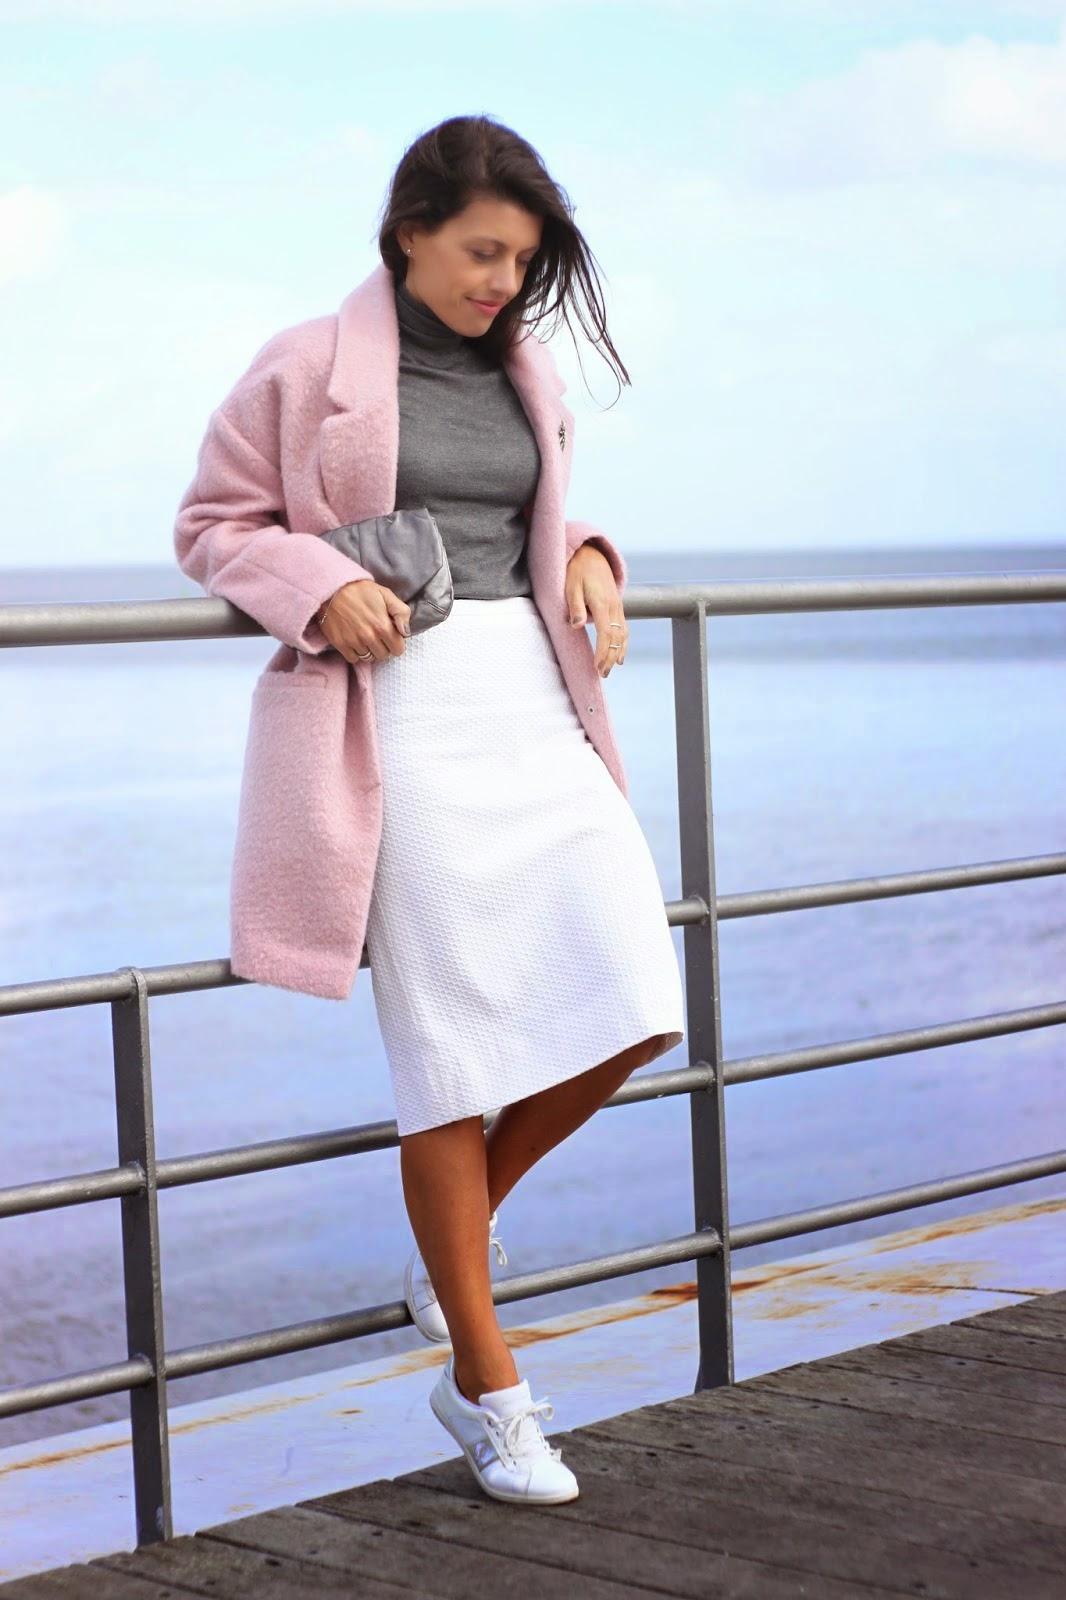 http://ilovefitametrica.blogspot.pt/2014/11/oversized-pink-coat.html